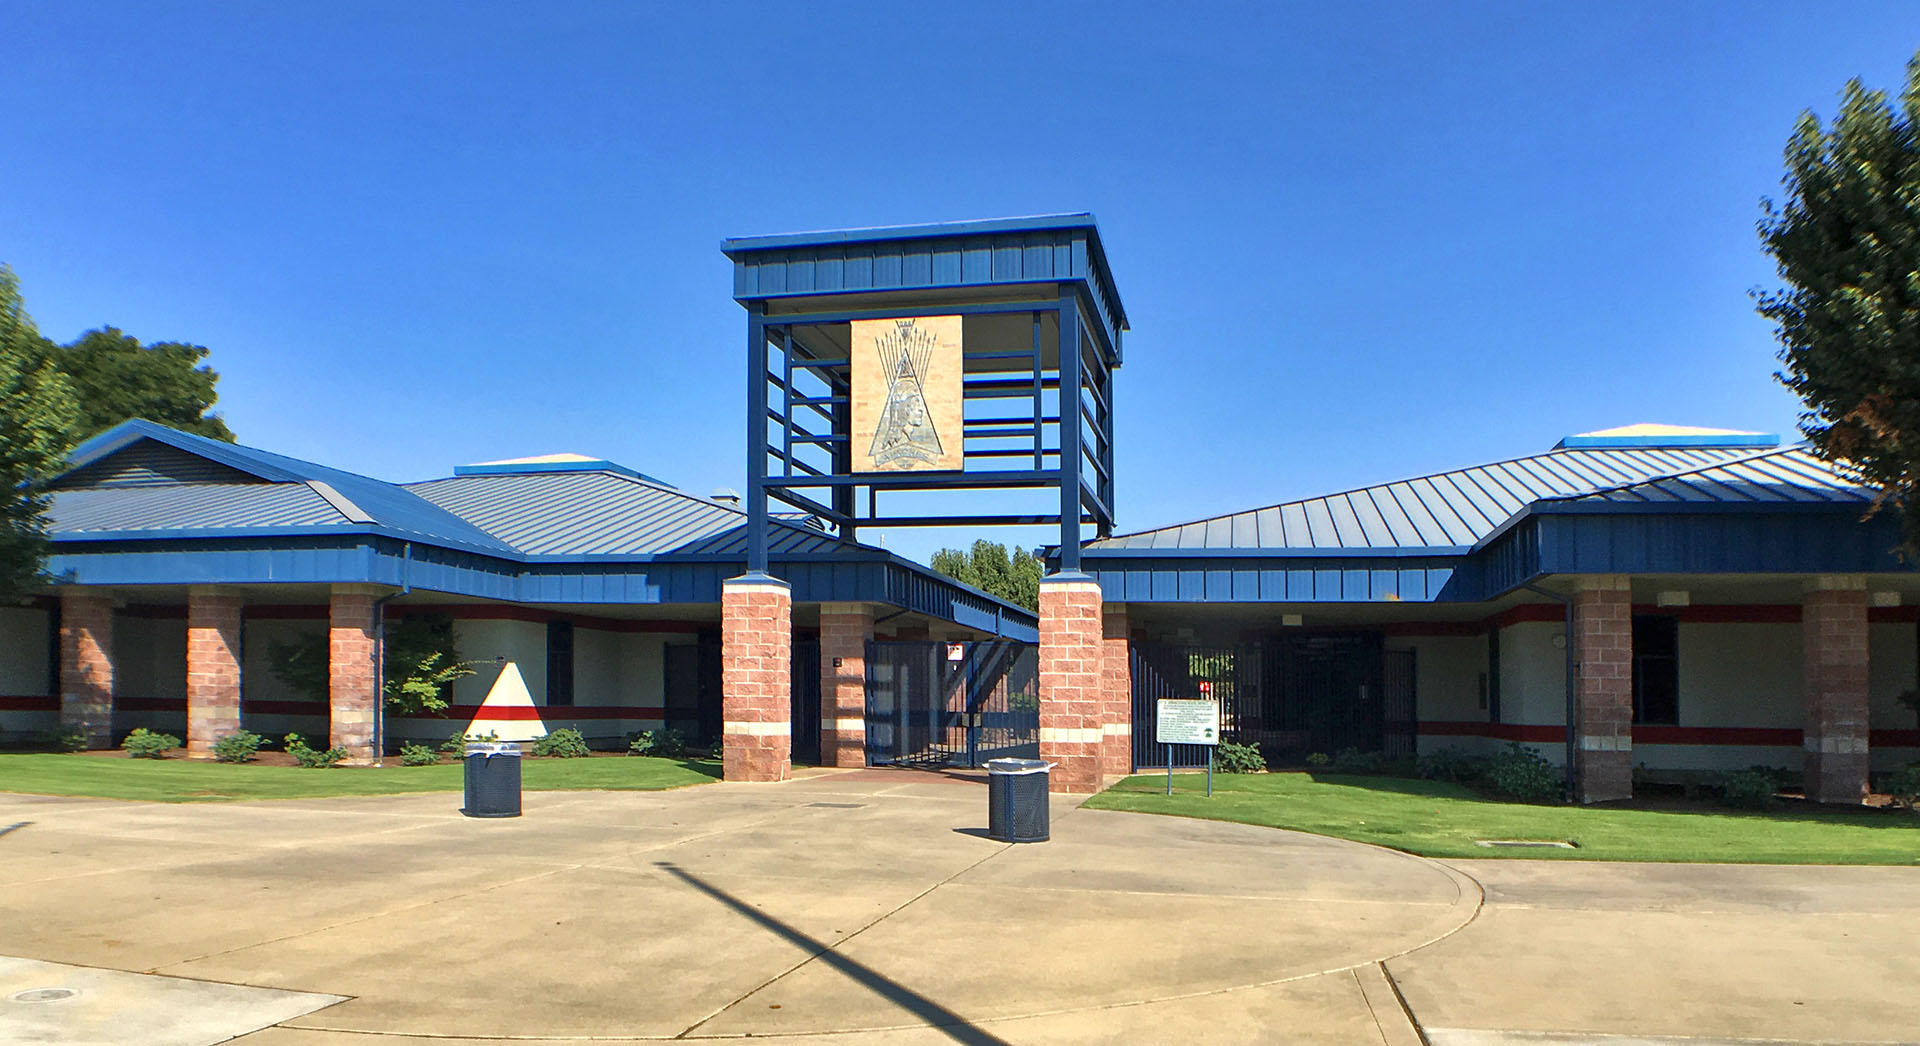 Sanger High School